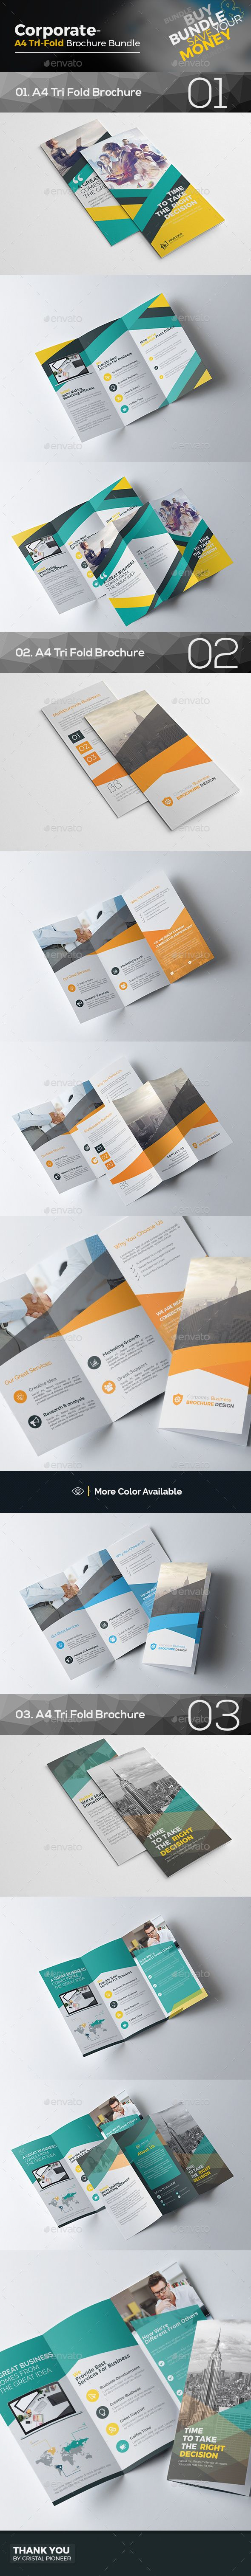 Tri Fold Brochure Bundle 3 in 1